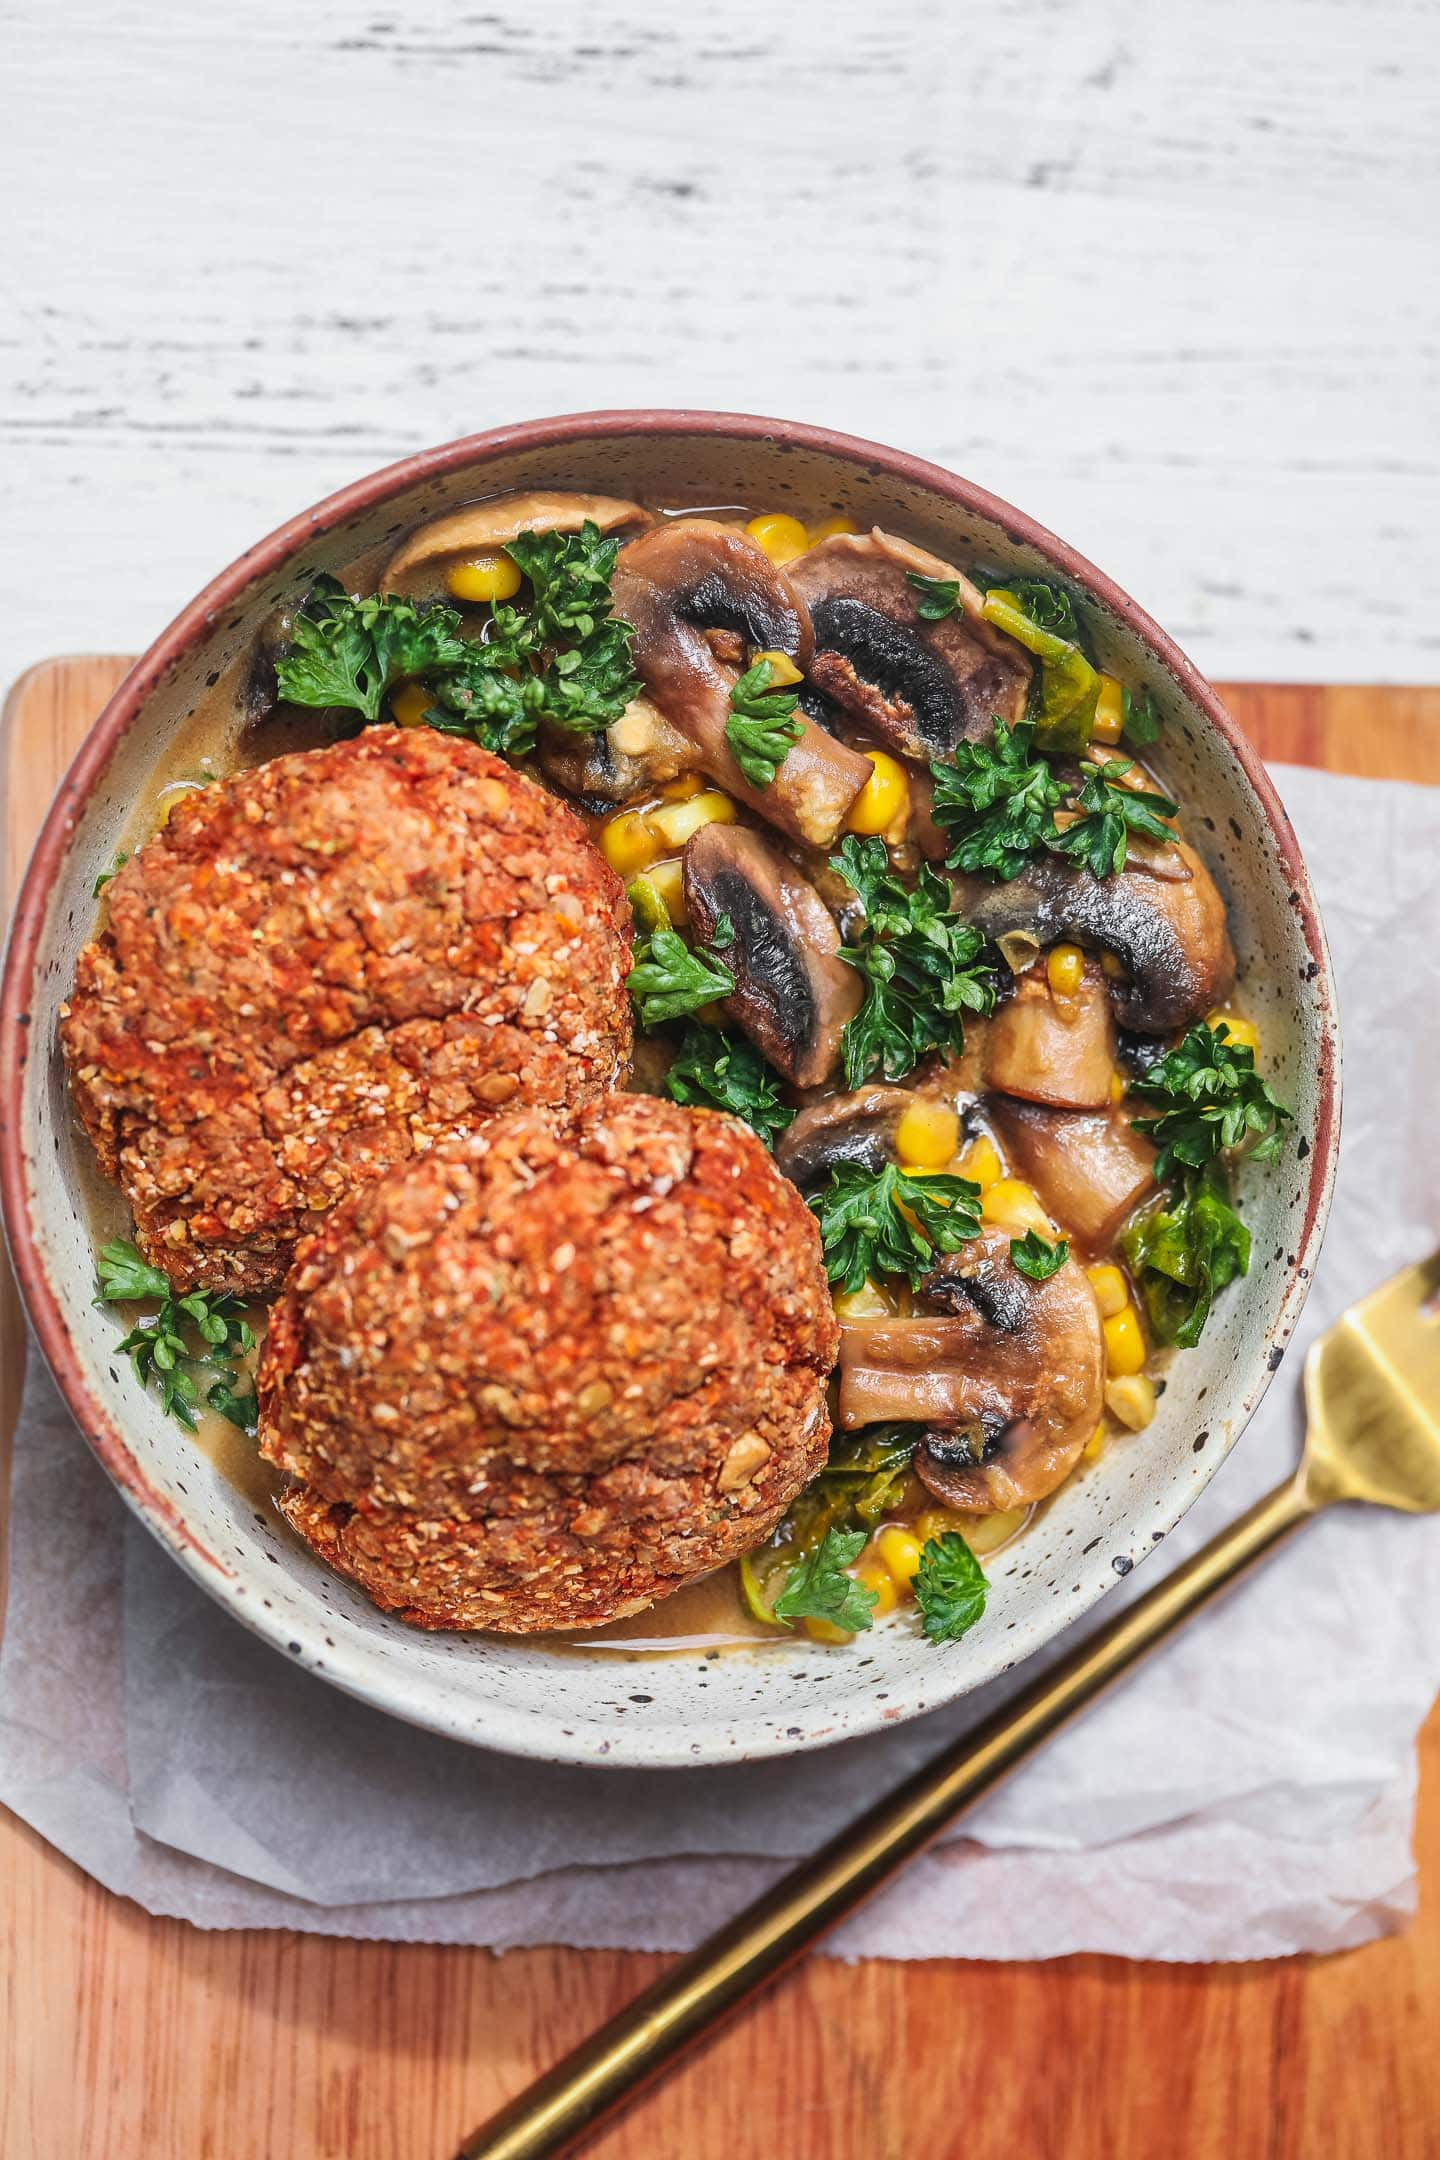 Vegan lentil burgers over a bowl of mushroom stew